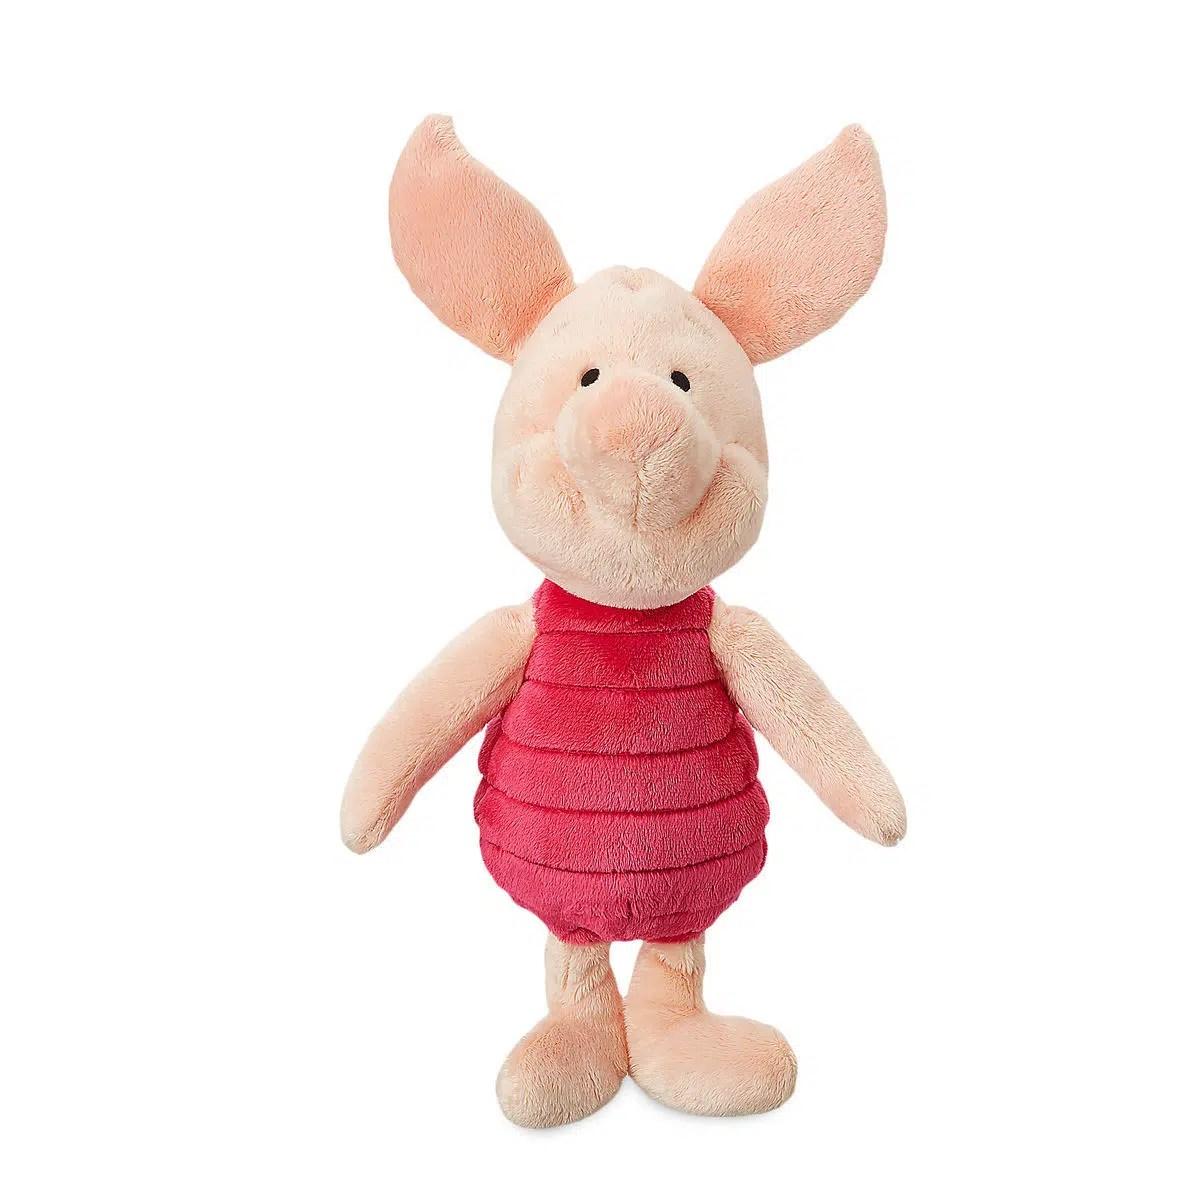 Piglet Stuffed Animal Plush Winnie The Pooh Christopher Robin Toys